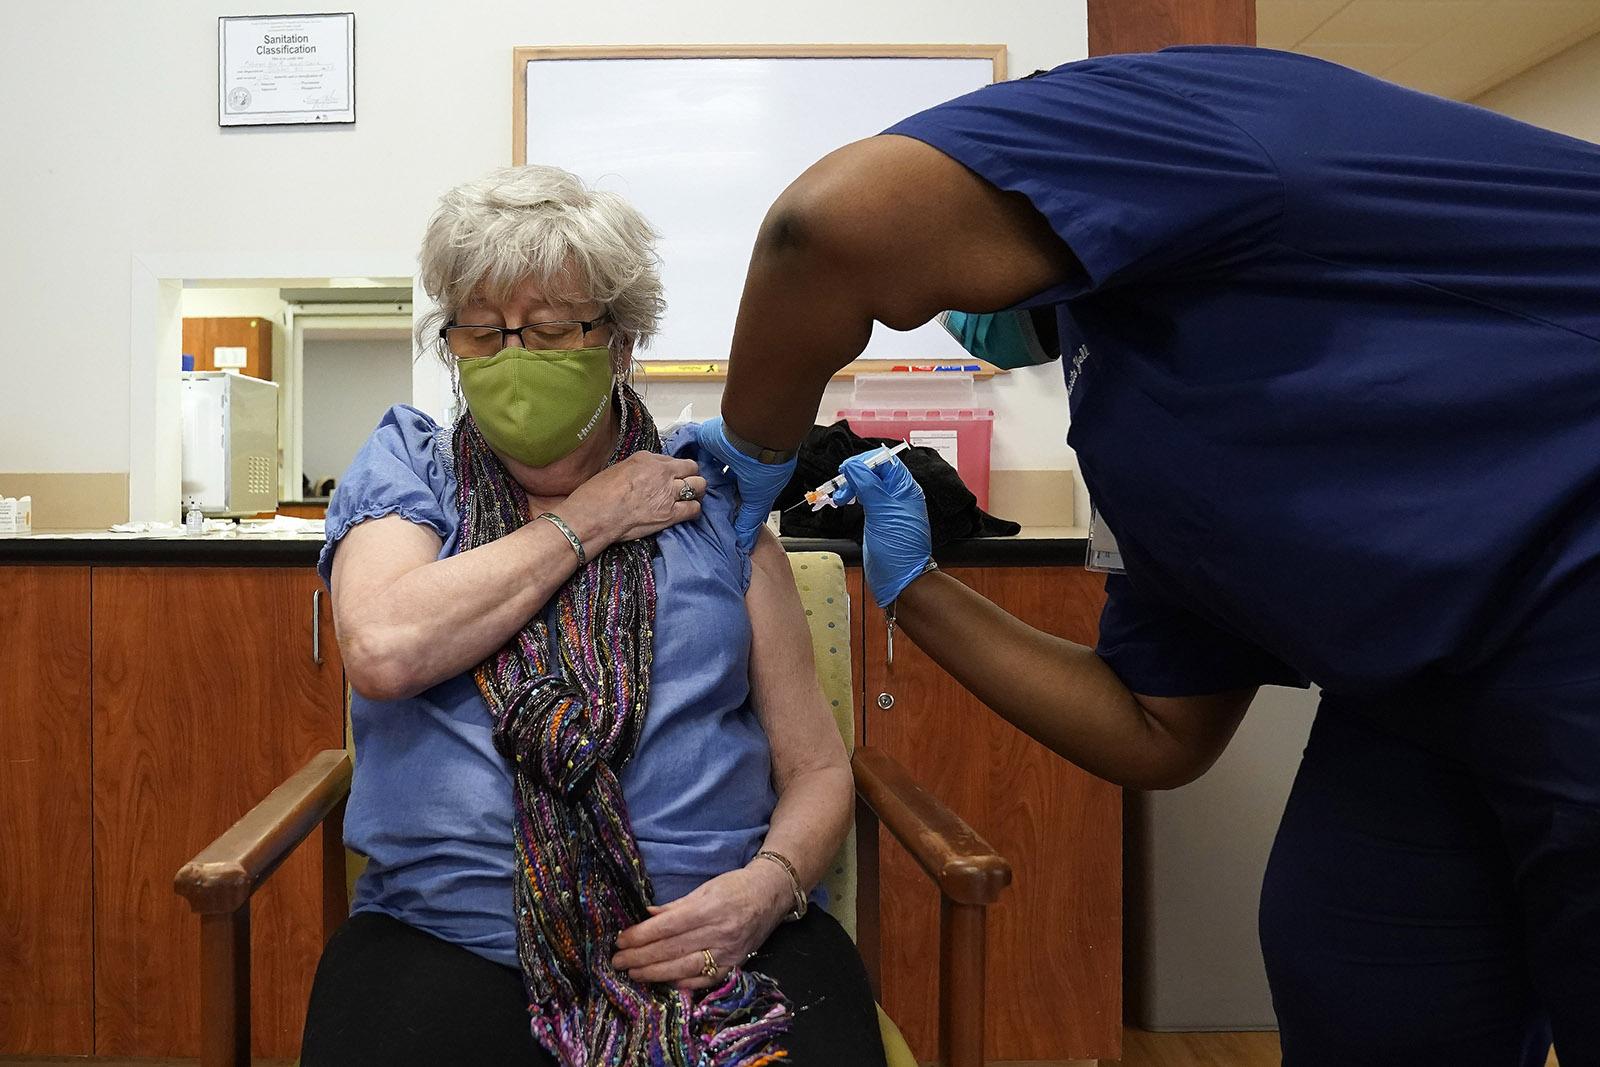 Martha Wilson, of Chapel Hill, gets a Covid-19 vaccine Thursday, January 28, in Pittsboro, North Carolina, at Piedmont Health Senior Care.